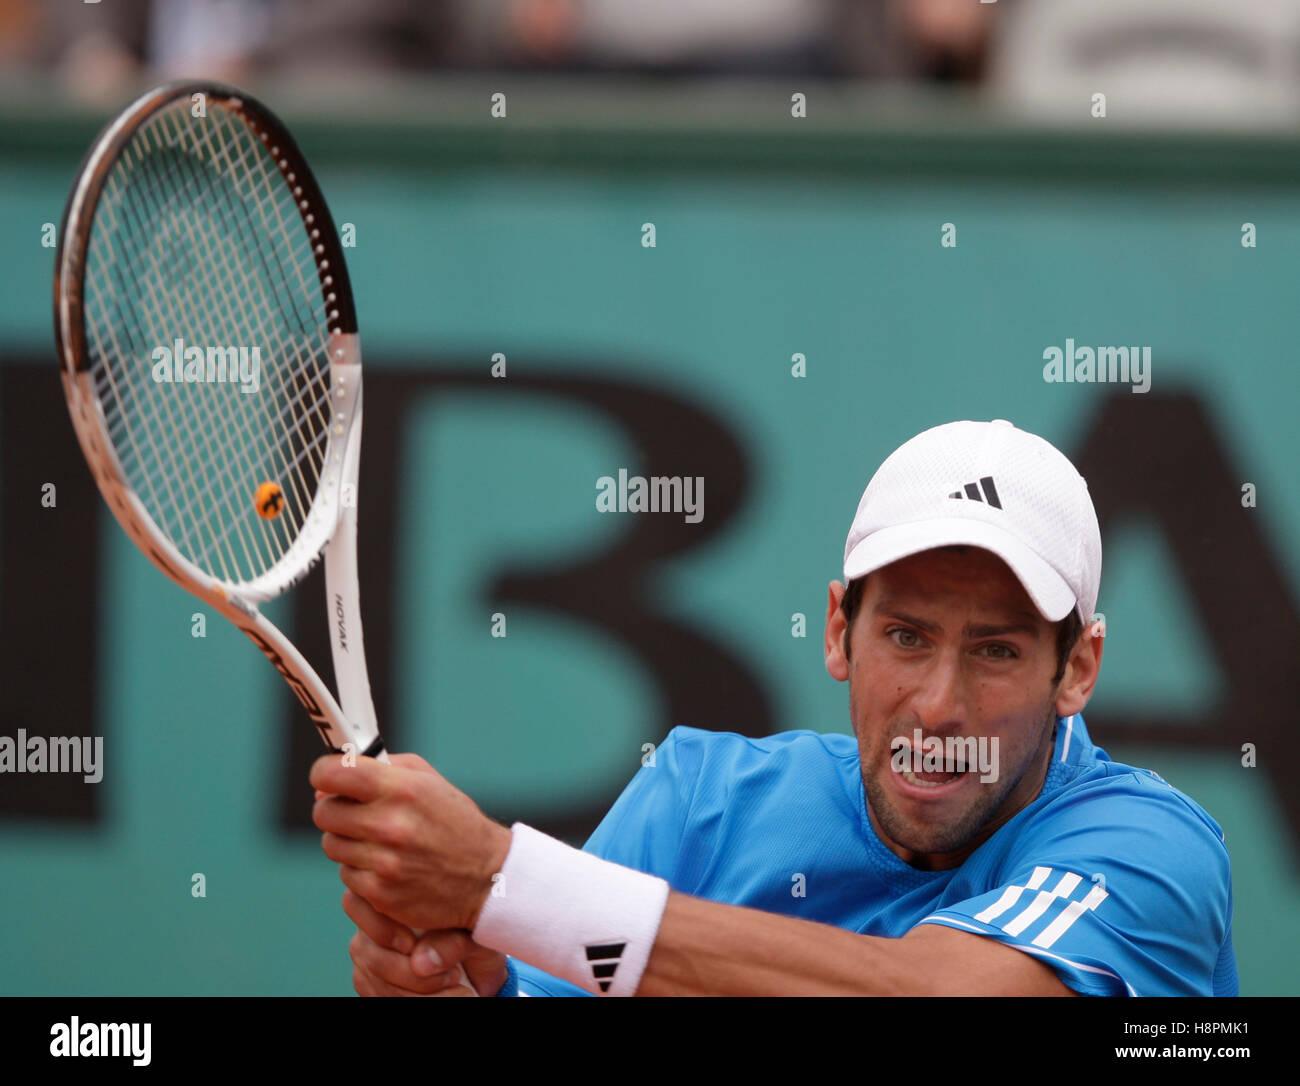 Novak Djokovic Backhand Stock Photos   Novak Djokovic Backhand Stock ... 081f367eab714